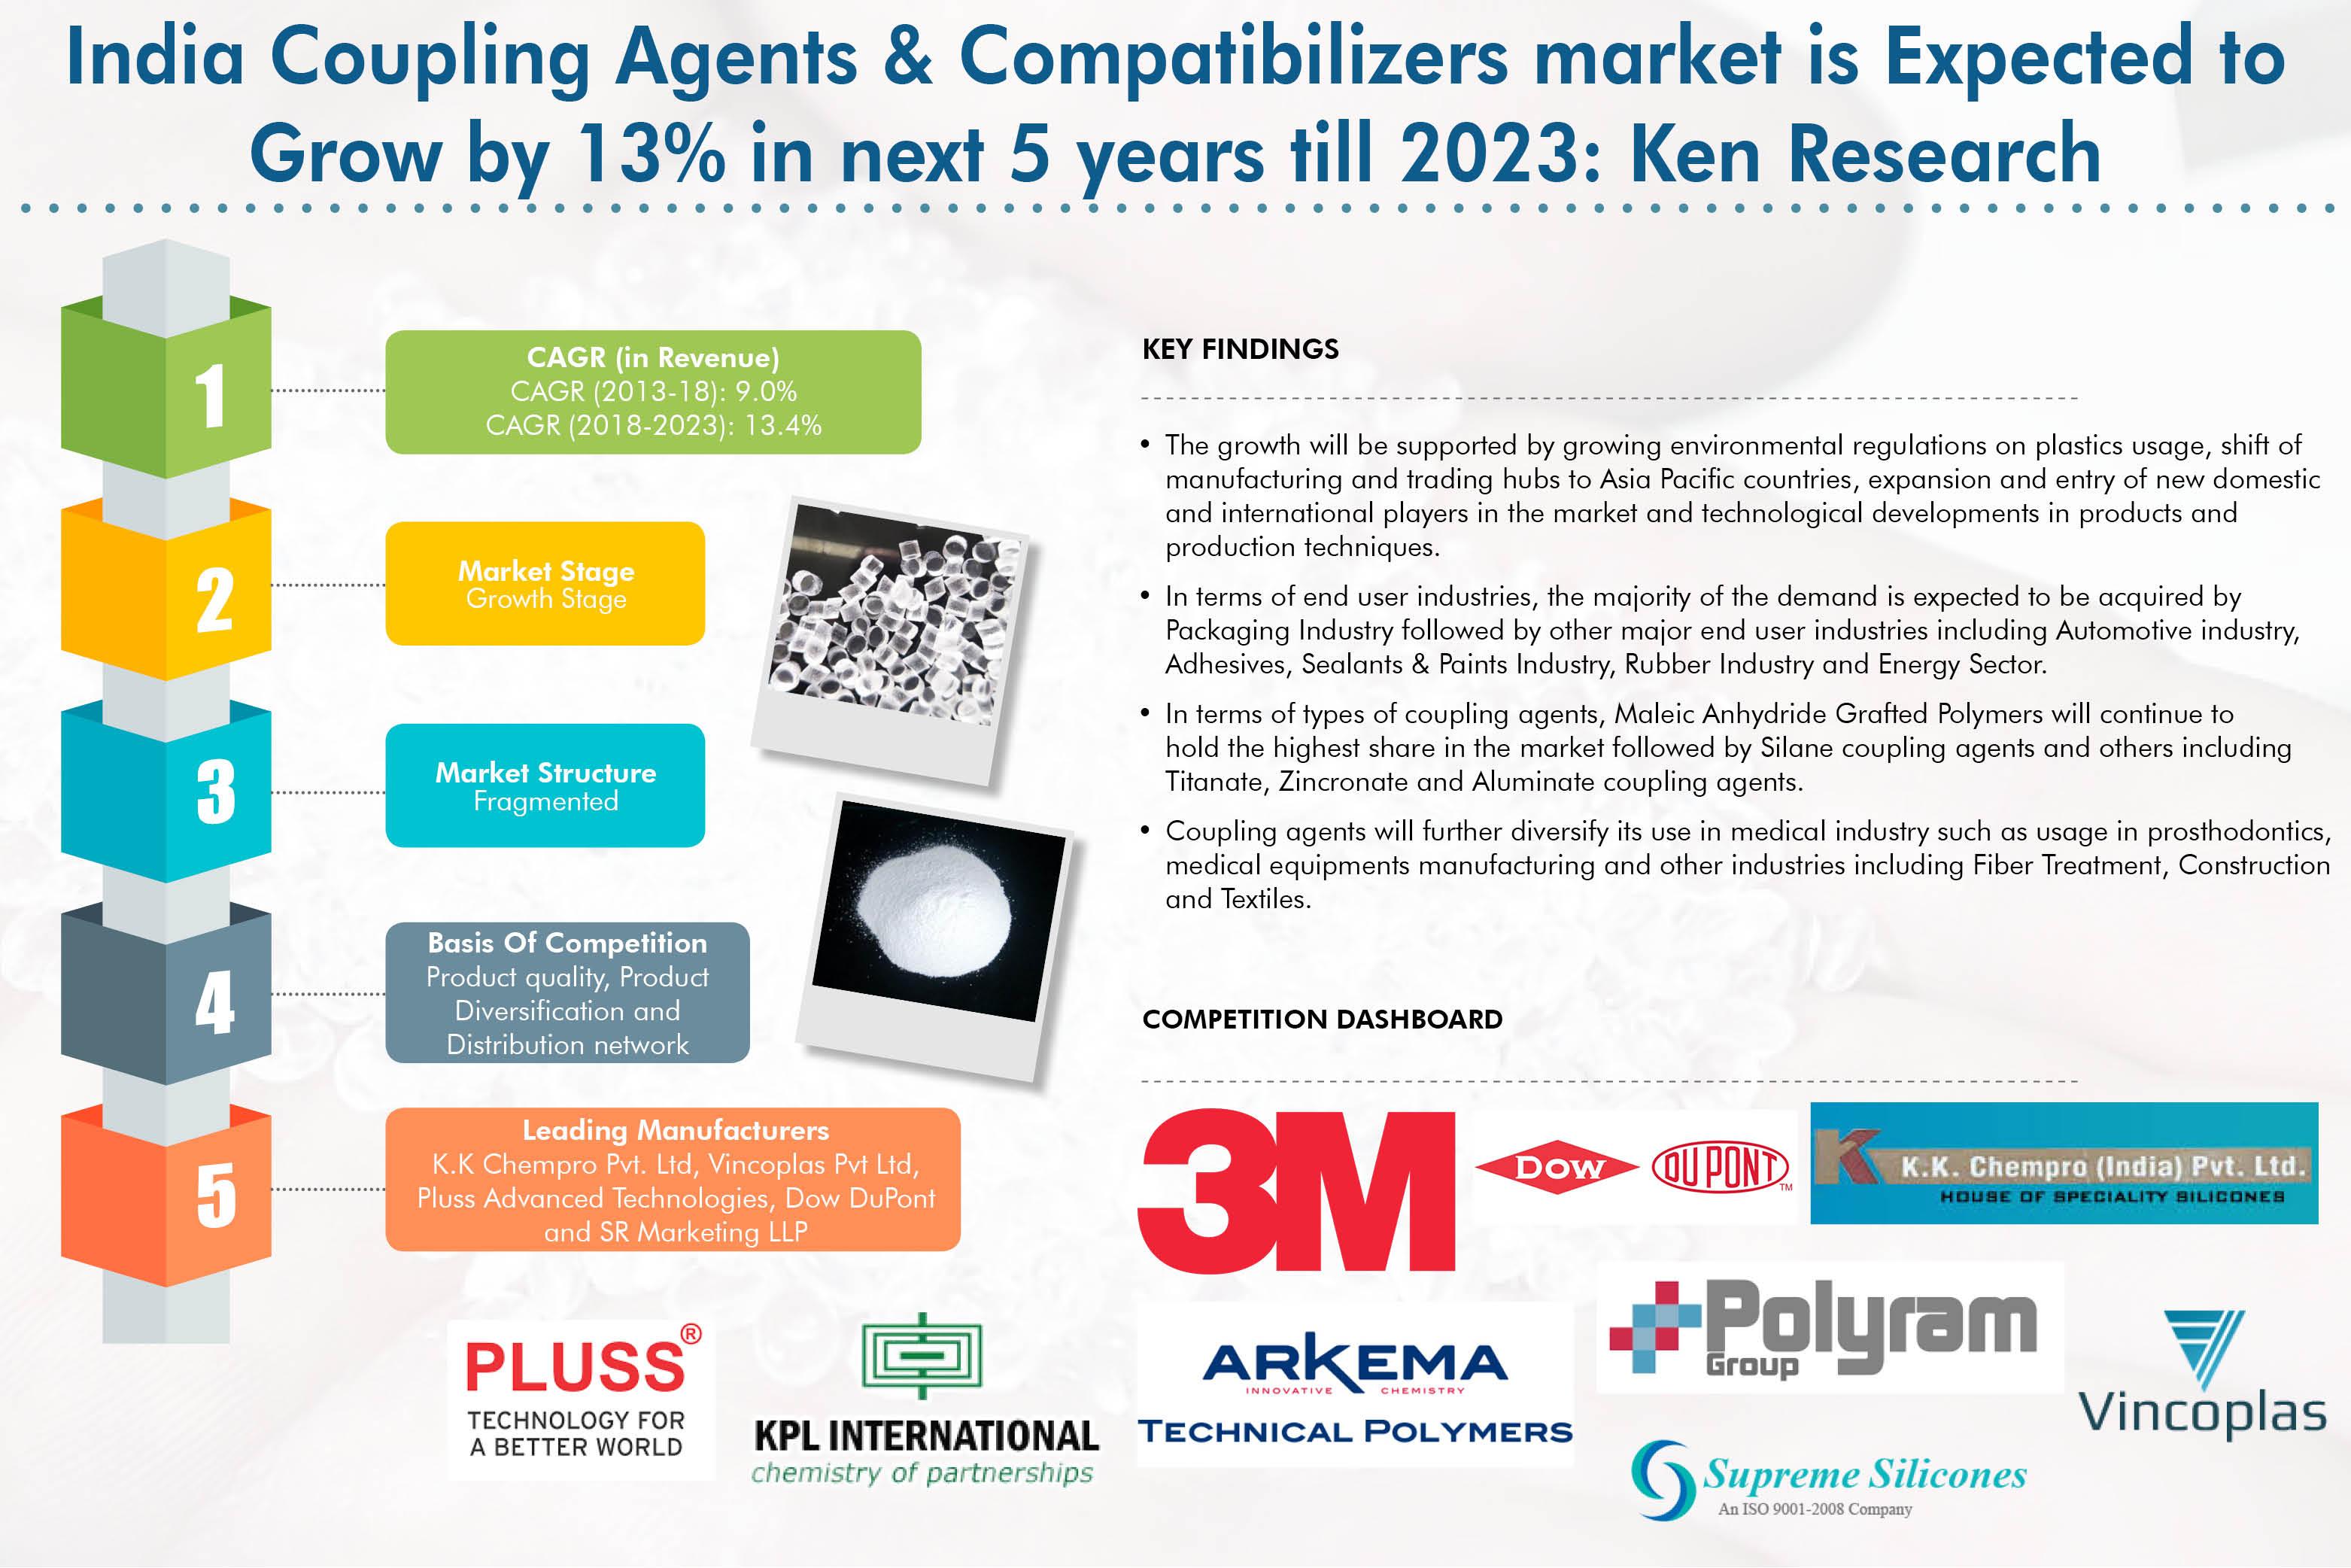 India Coupling Agents & Compatibilizers Market